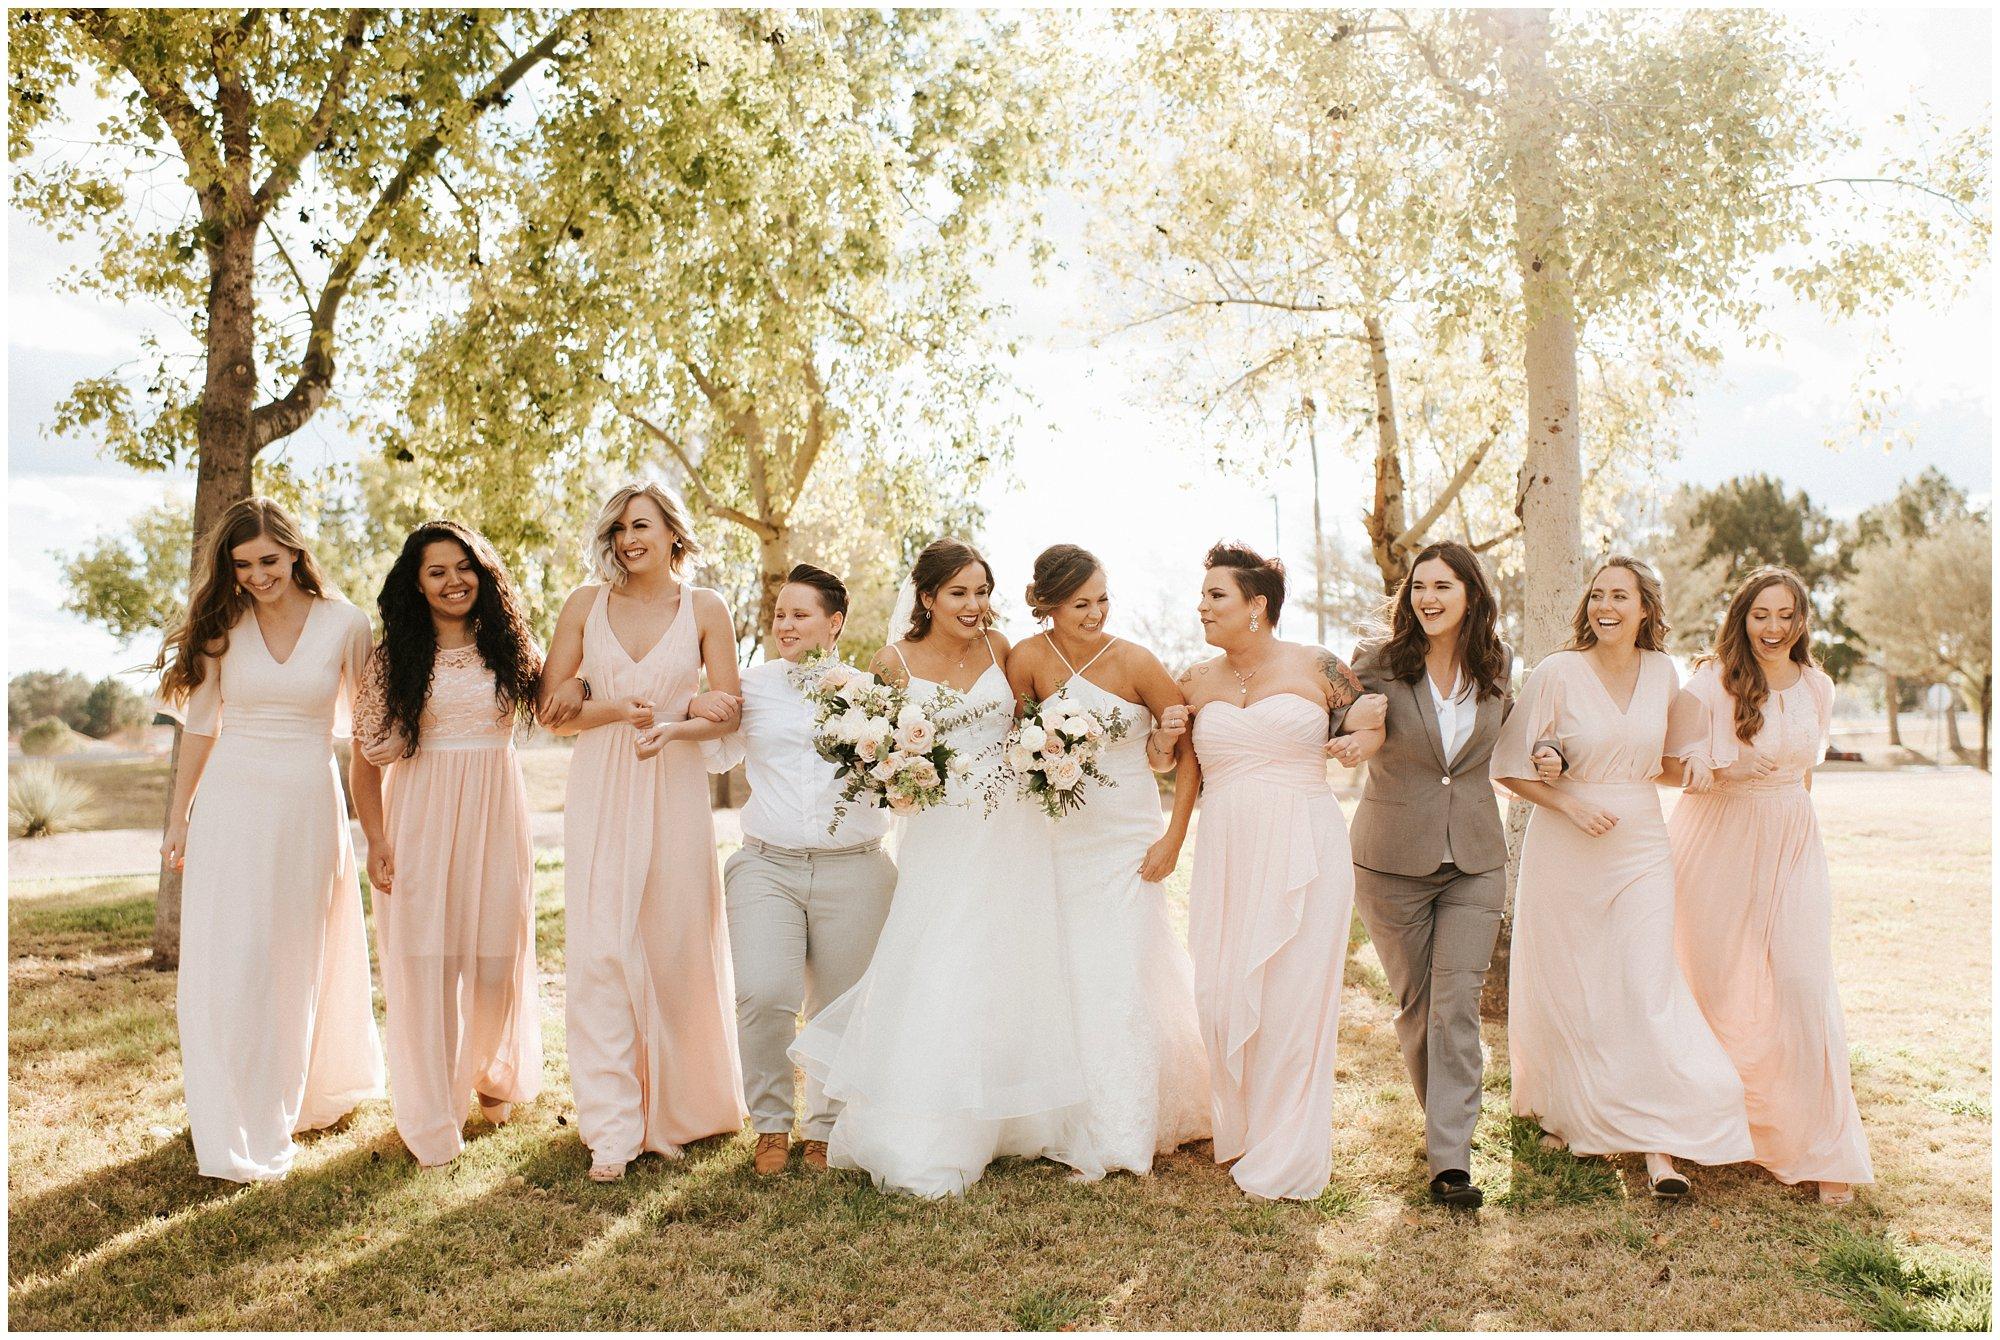 arizona same sex wedding photographer - jenni and lauren wedding the islands clubhouse_0034.jpg